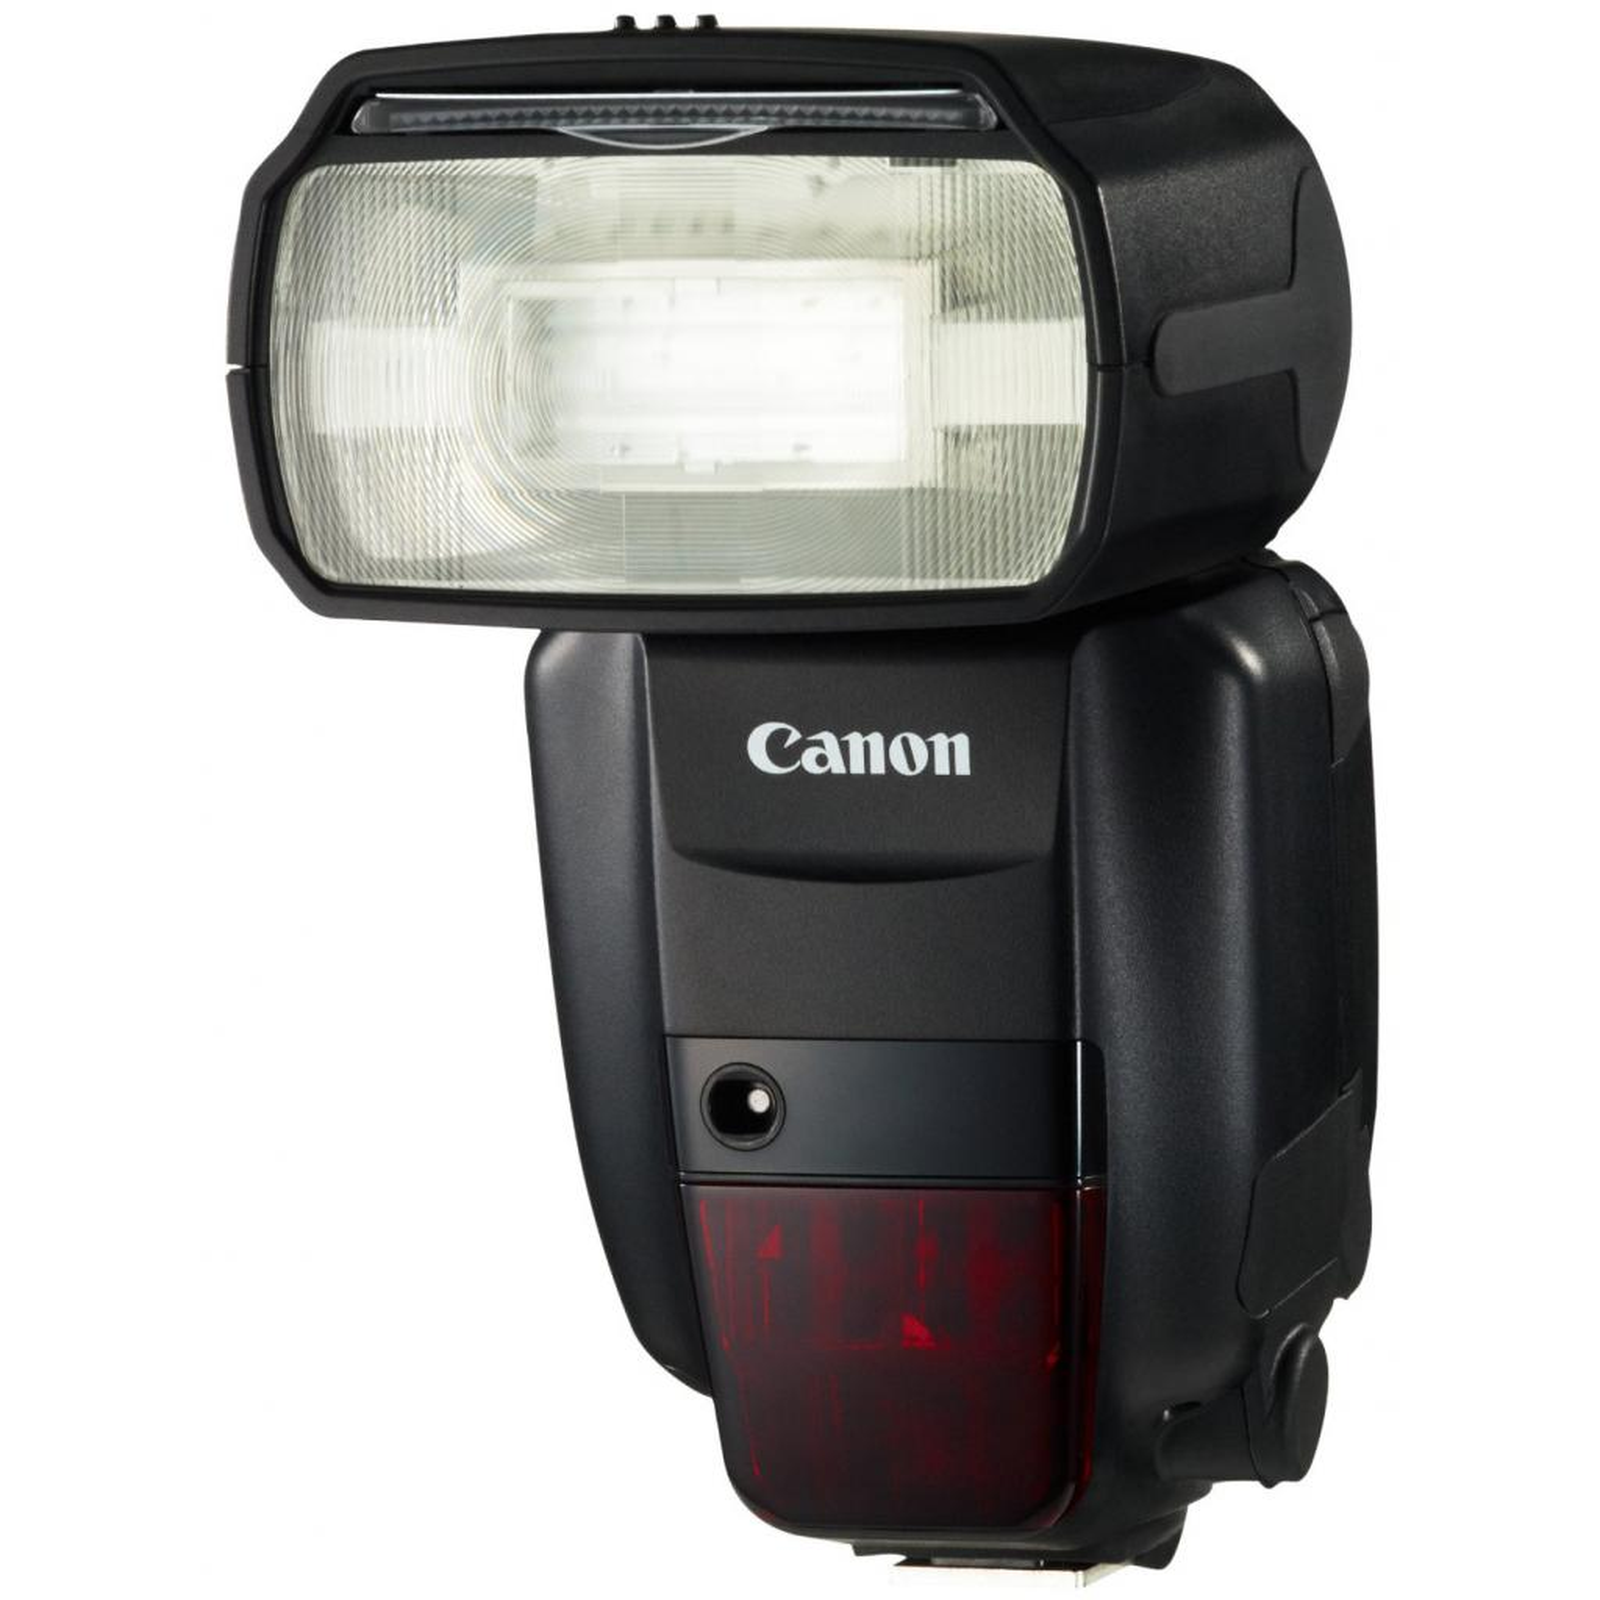 Вспышка Canon Speedlite 600EX (5739B003) изображение 3